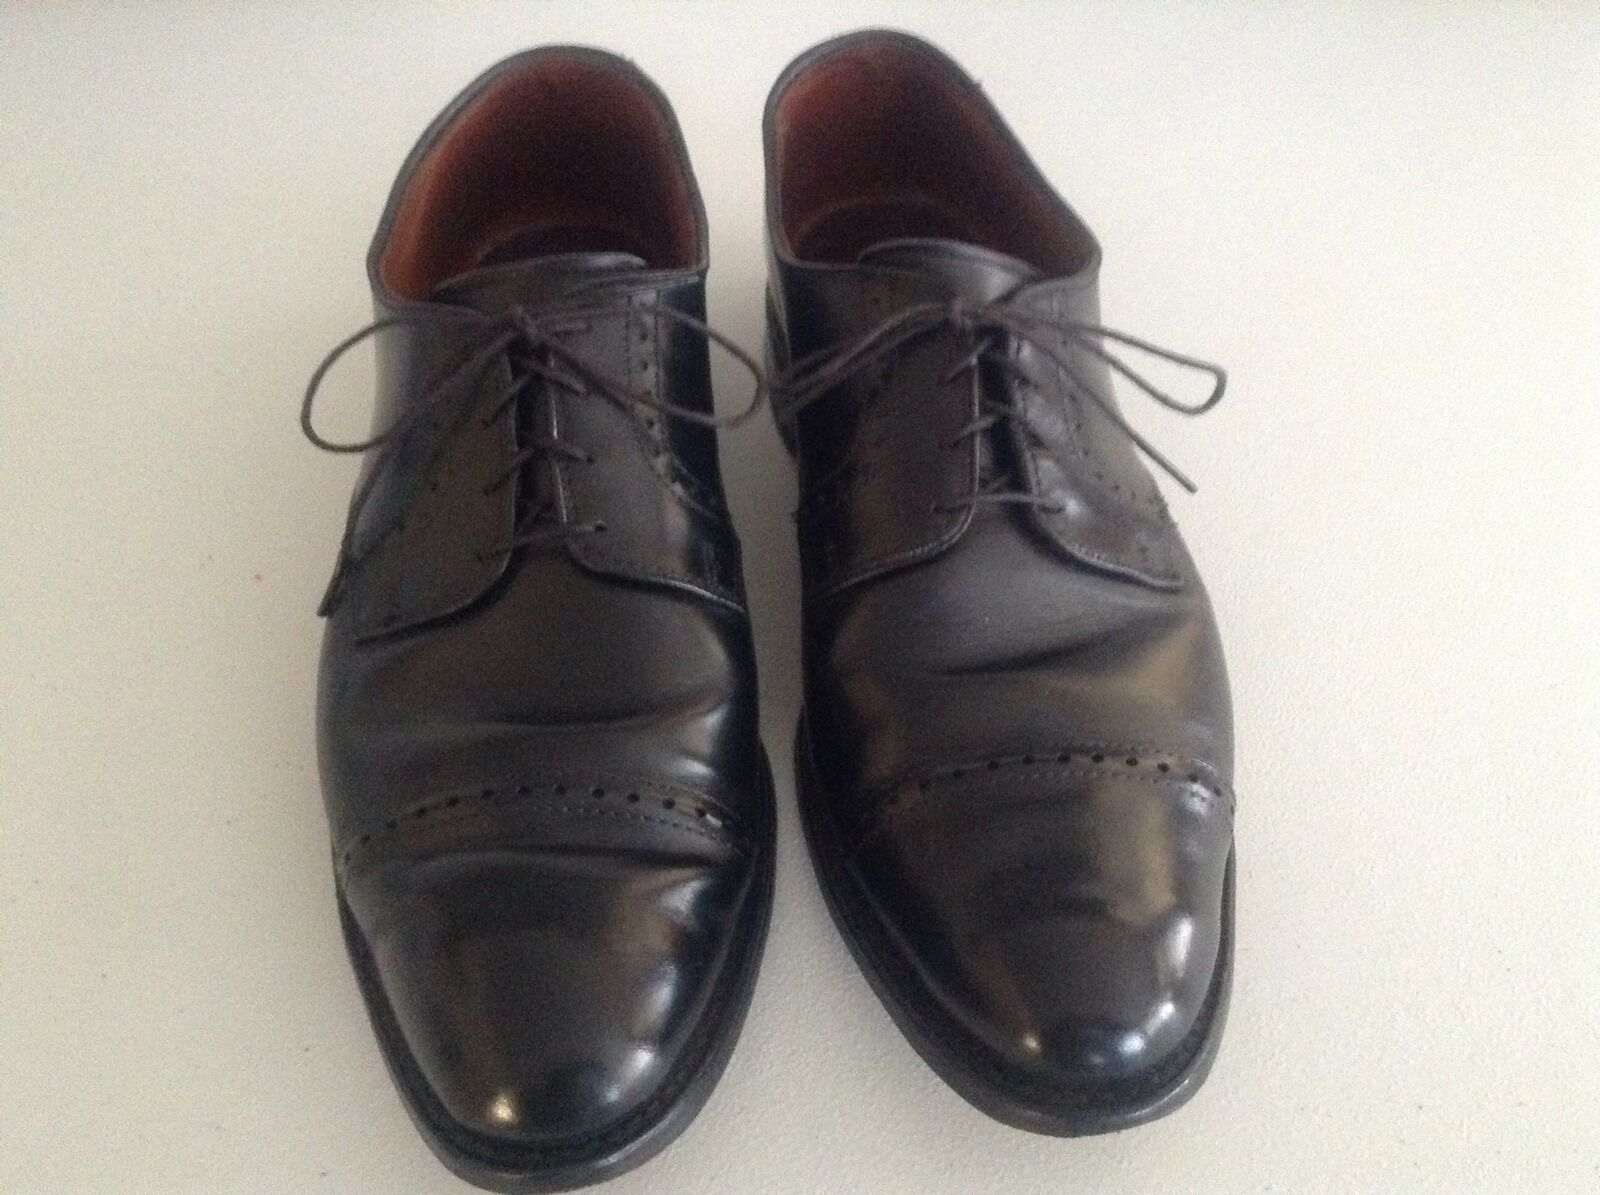 saldi Uomo Allen Edmonds Clifton nero Leather Cap Toe Toe Toe Dress Oxford Dress scarpe 11.5D  vendita con alto sconto